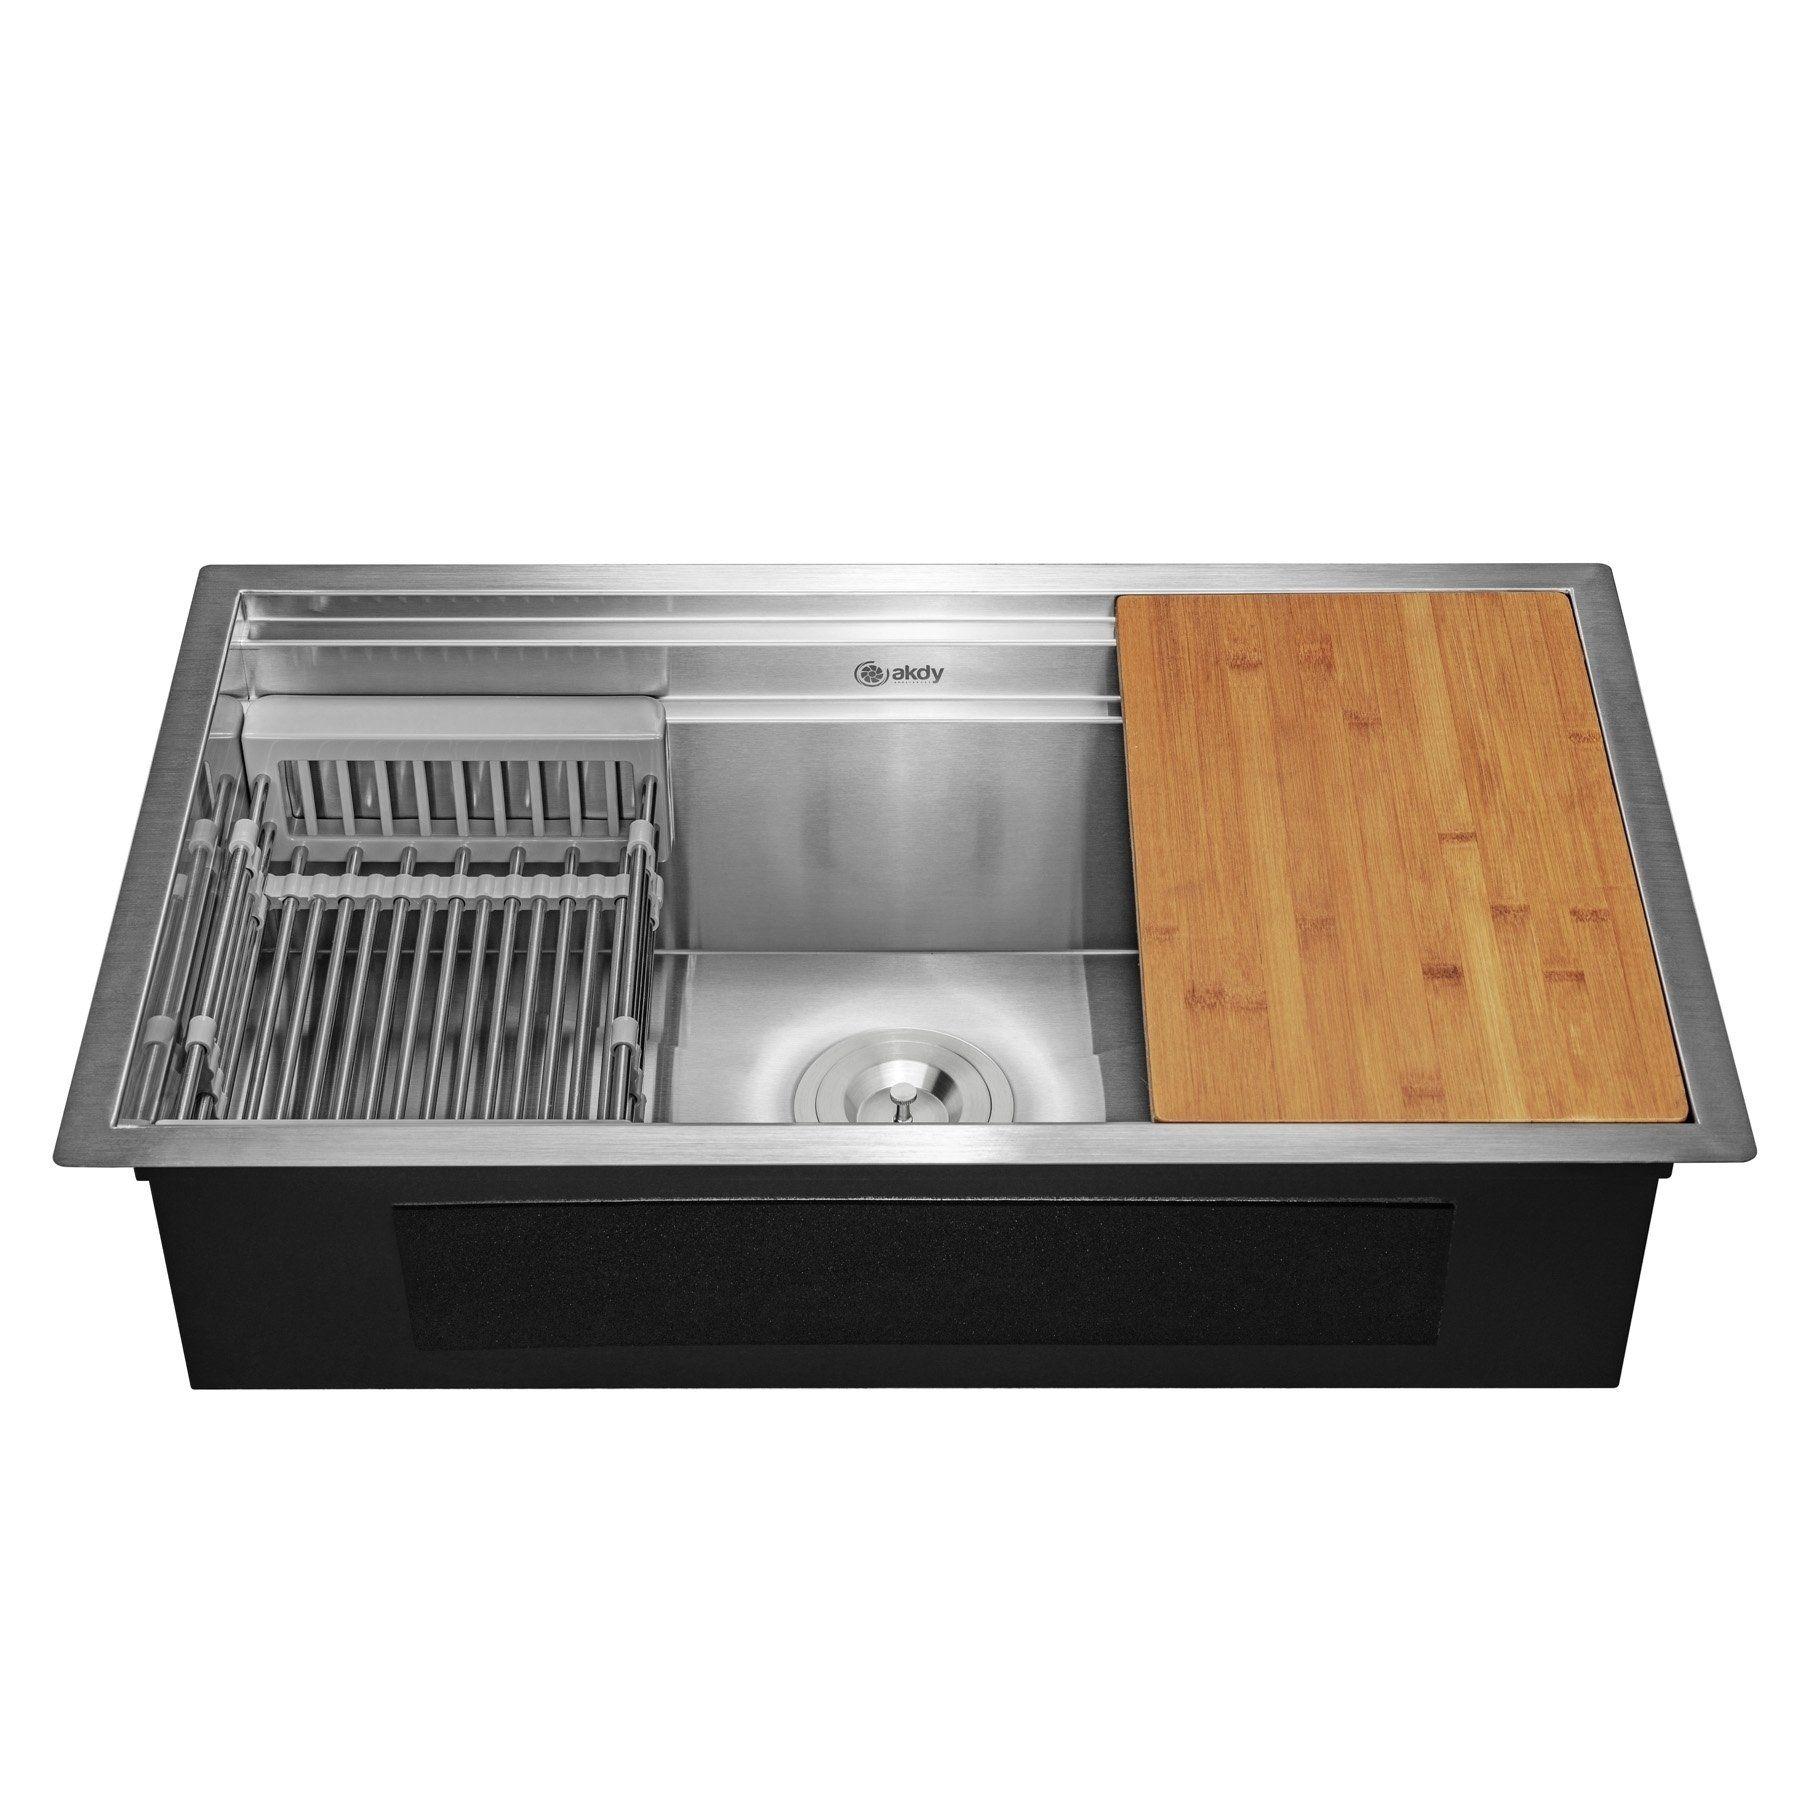 Pin By Majda On Ideas For Building In 2020 Undermount Kitchen Sinks Single Bowl Kitchen Sink Stainless Steel Kitchen Sink